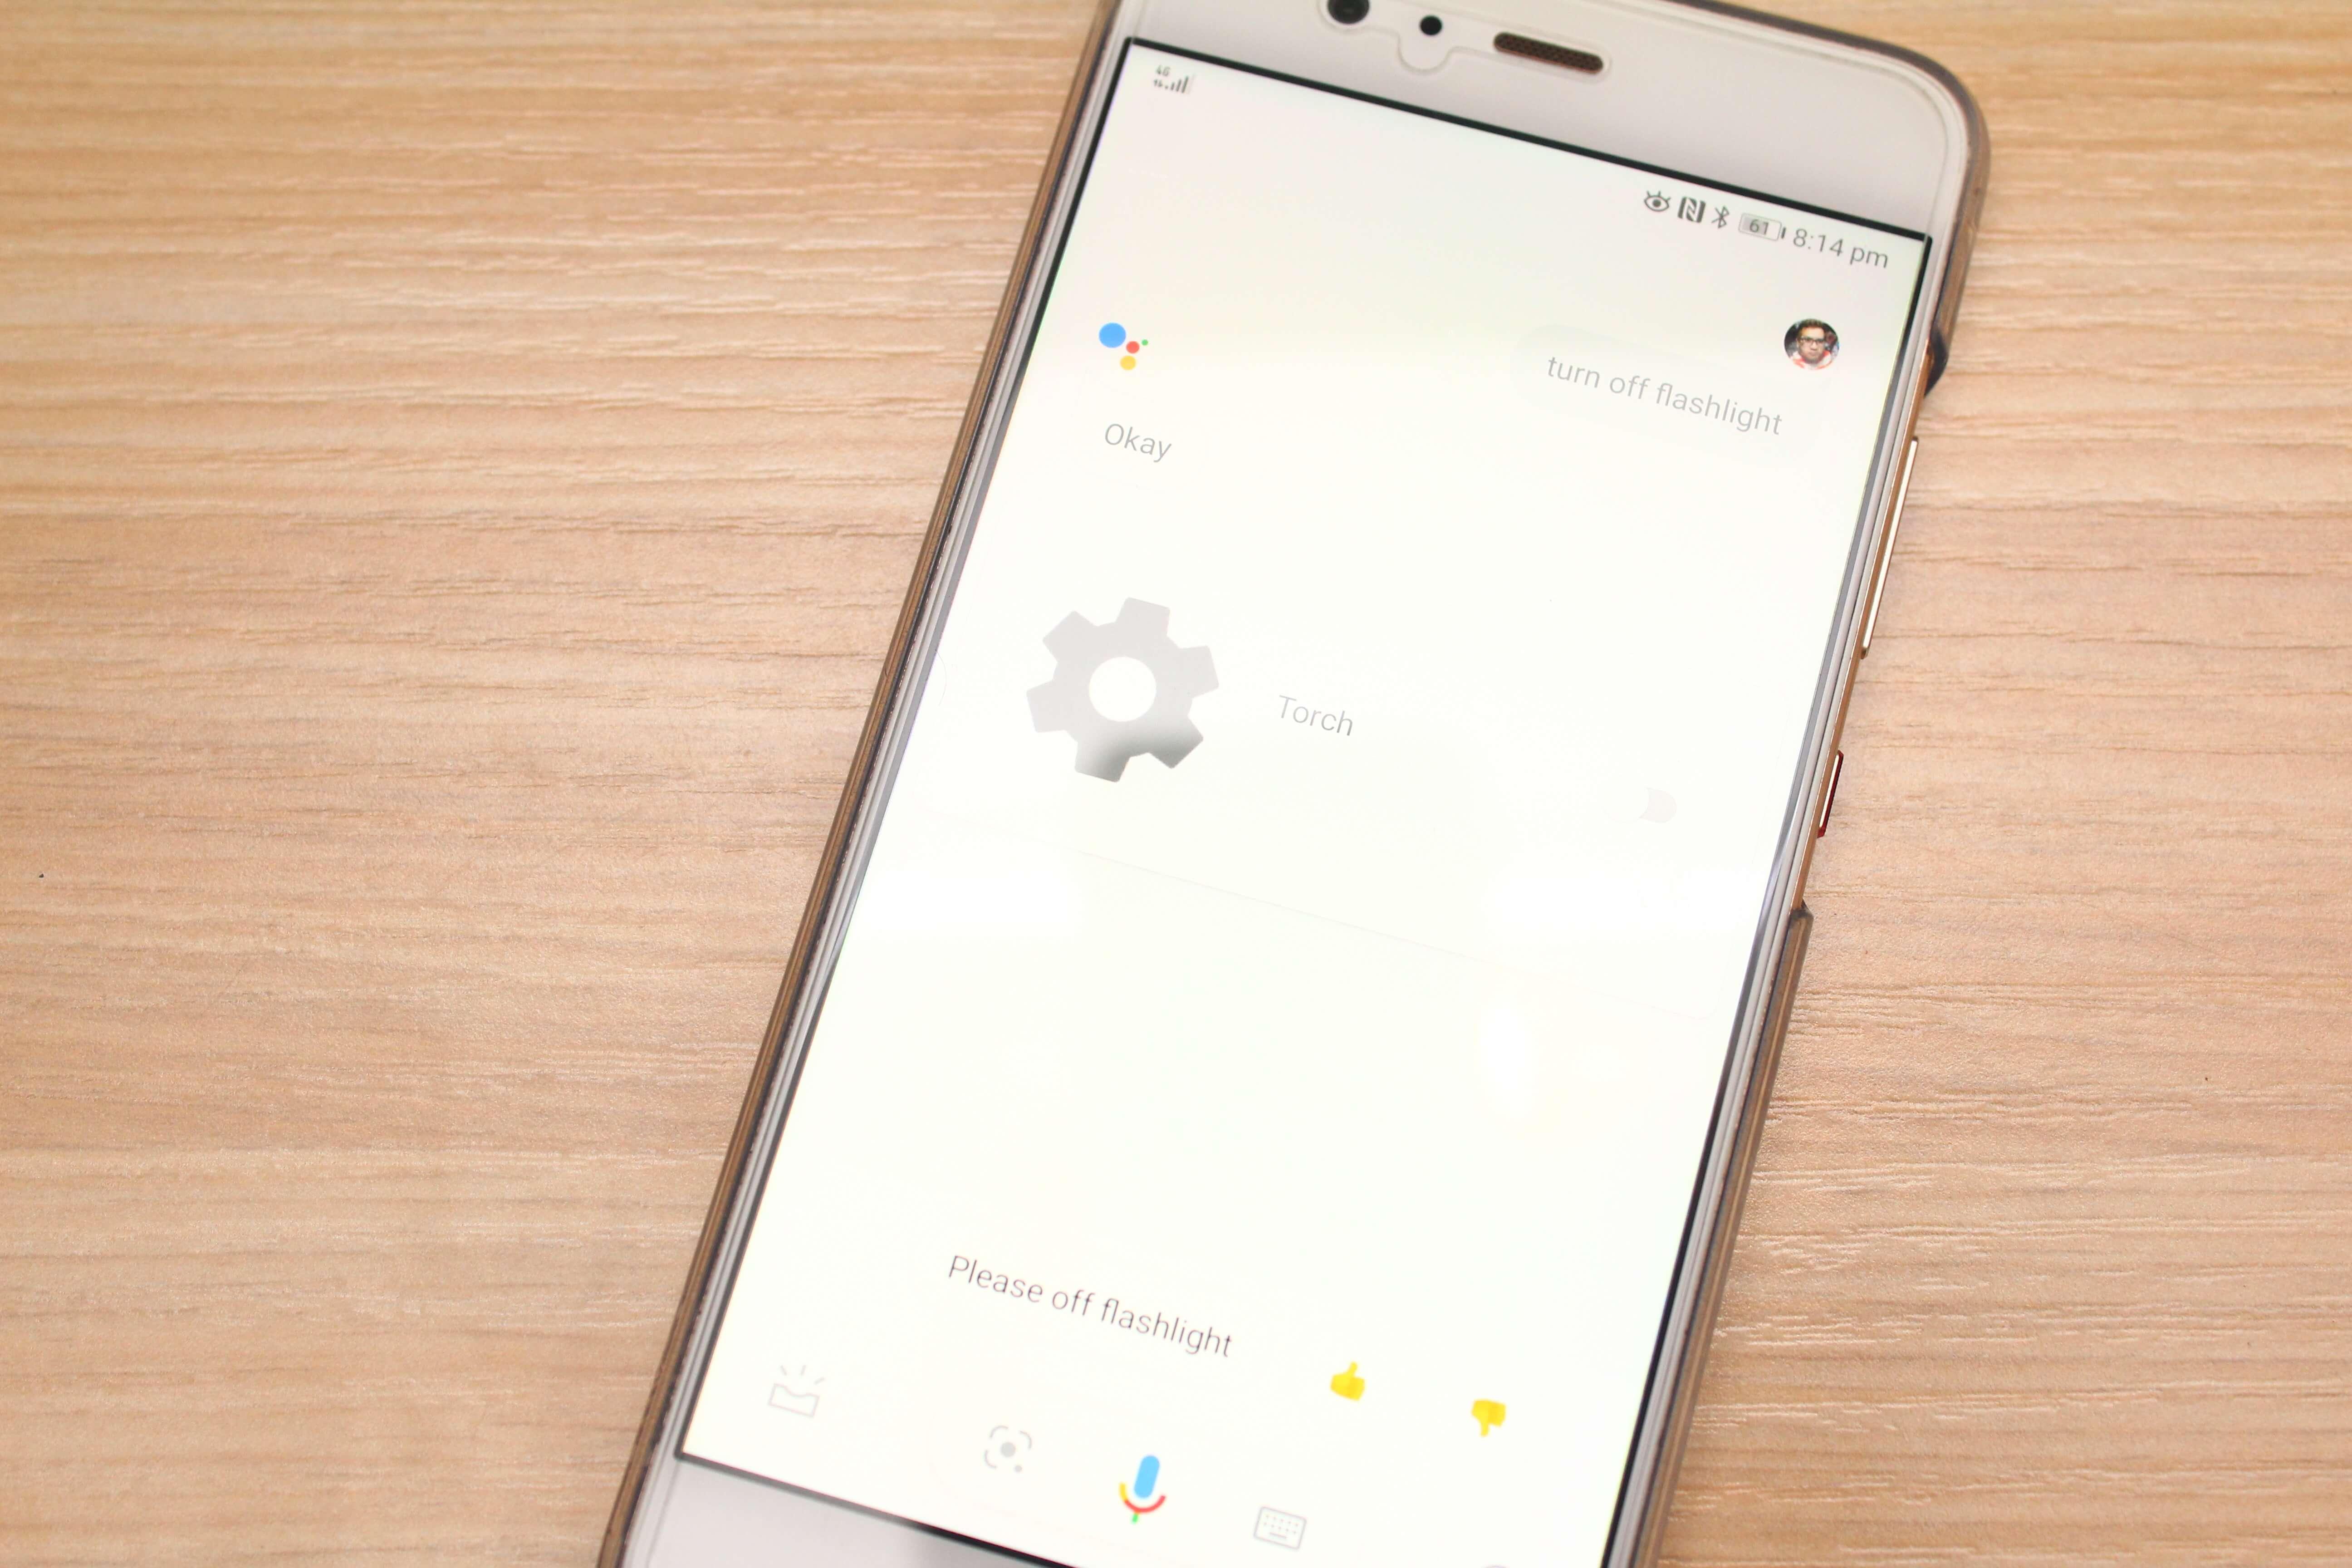 "como ligar a lanterna-dispositivo-android-google-assistant-2 ""width ="" 700 ""height ="" 467 ""srcset ="" https://joyofandroid.com/wp-content/uploads/2017/11 /how-to-turn-on-flashlight-device-android-google-assistant-2.jpg 5184w, https://joyofandroid.com/wp-content/uploads/2017/11/how-to-turn-on- lanterna-dispositivo-android-google-assistente-2-300x200.jpg 300w, https://joyofandroid.com/wp-content/uploads/2017/11/how-to-turn-on-flashlight-device-android-google -assistant-2-768x512.jpg 768w, https://joyofandroid.com/wp-content/uploads/2017/11/how-to-turn-on-flashlight-device-android-google-assistant-2-1024x683. jpg 1024w ""tamanhos ="" (largura máxima: 700px) 100vw, 700px ""/></noscript data-recalc-dims="